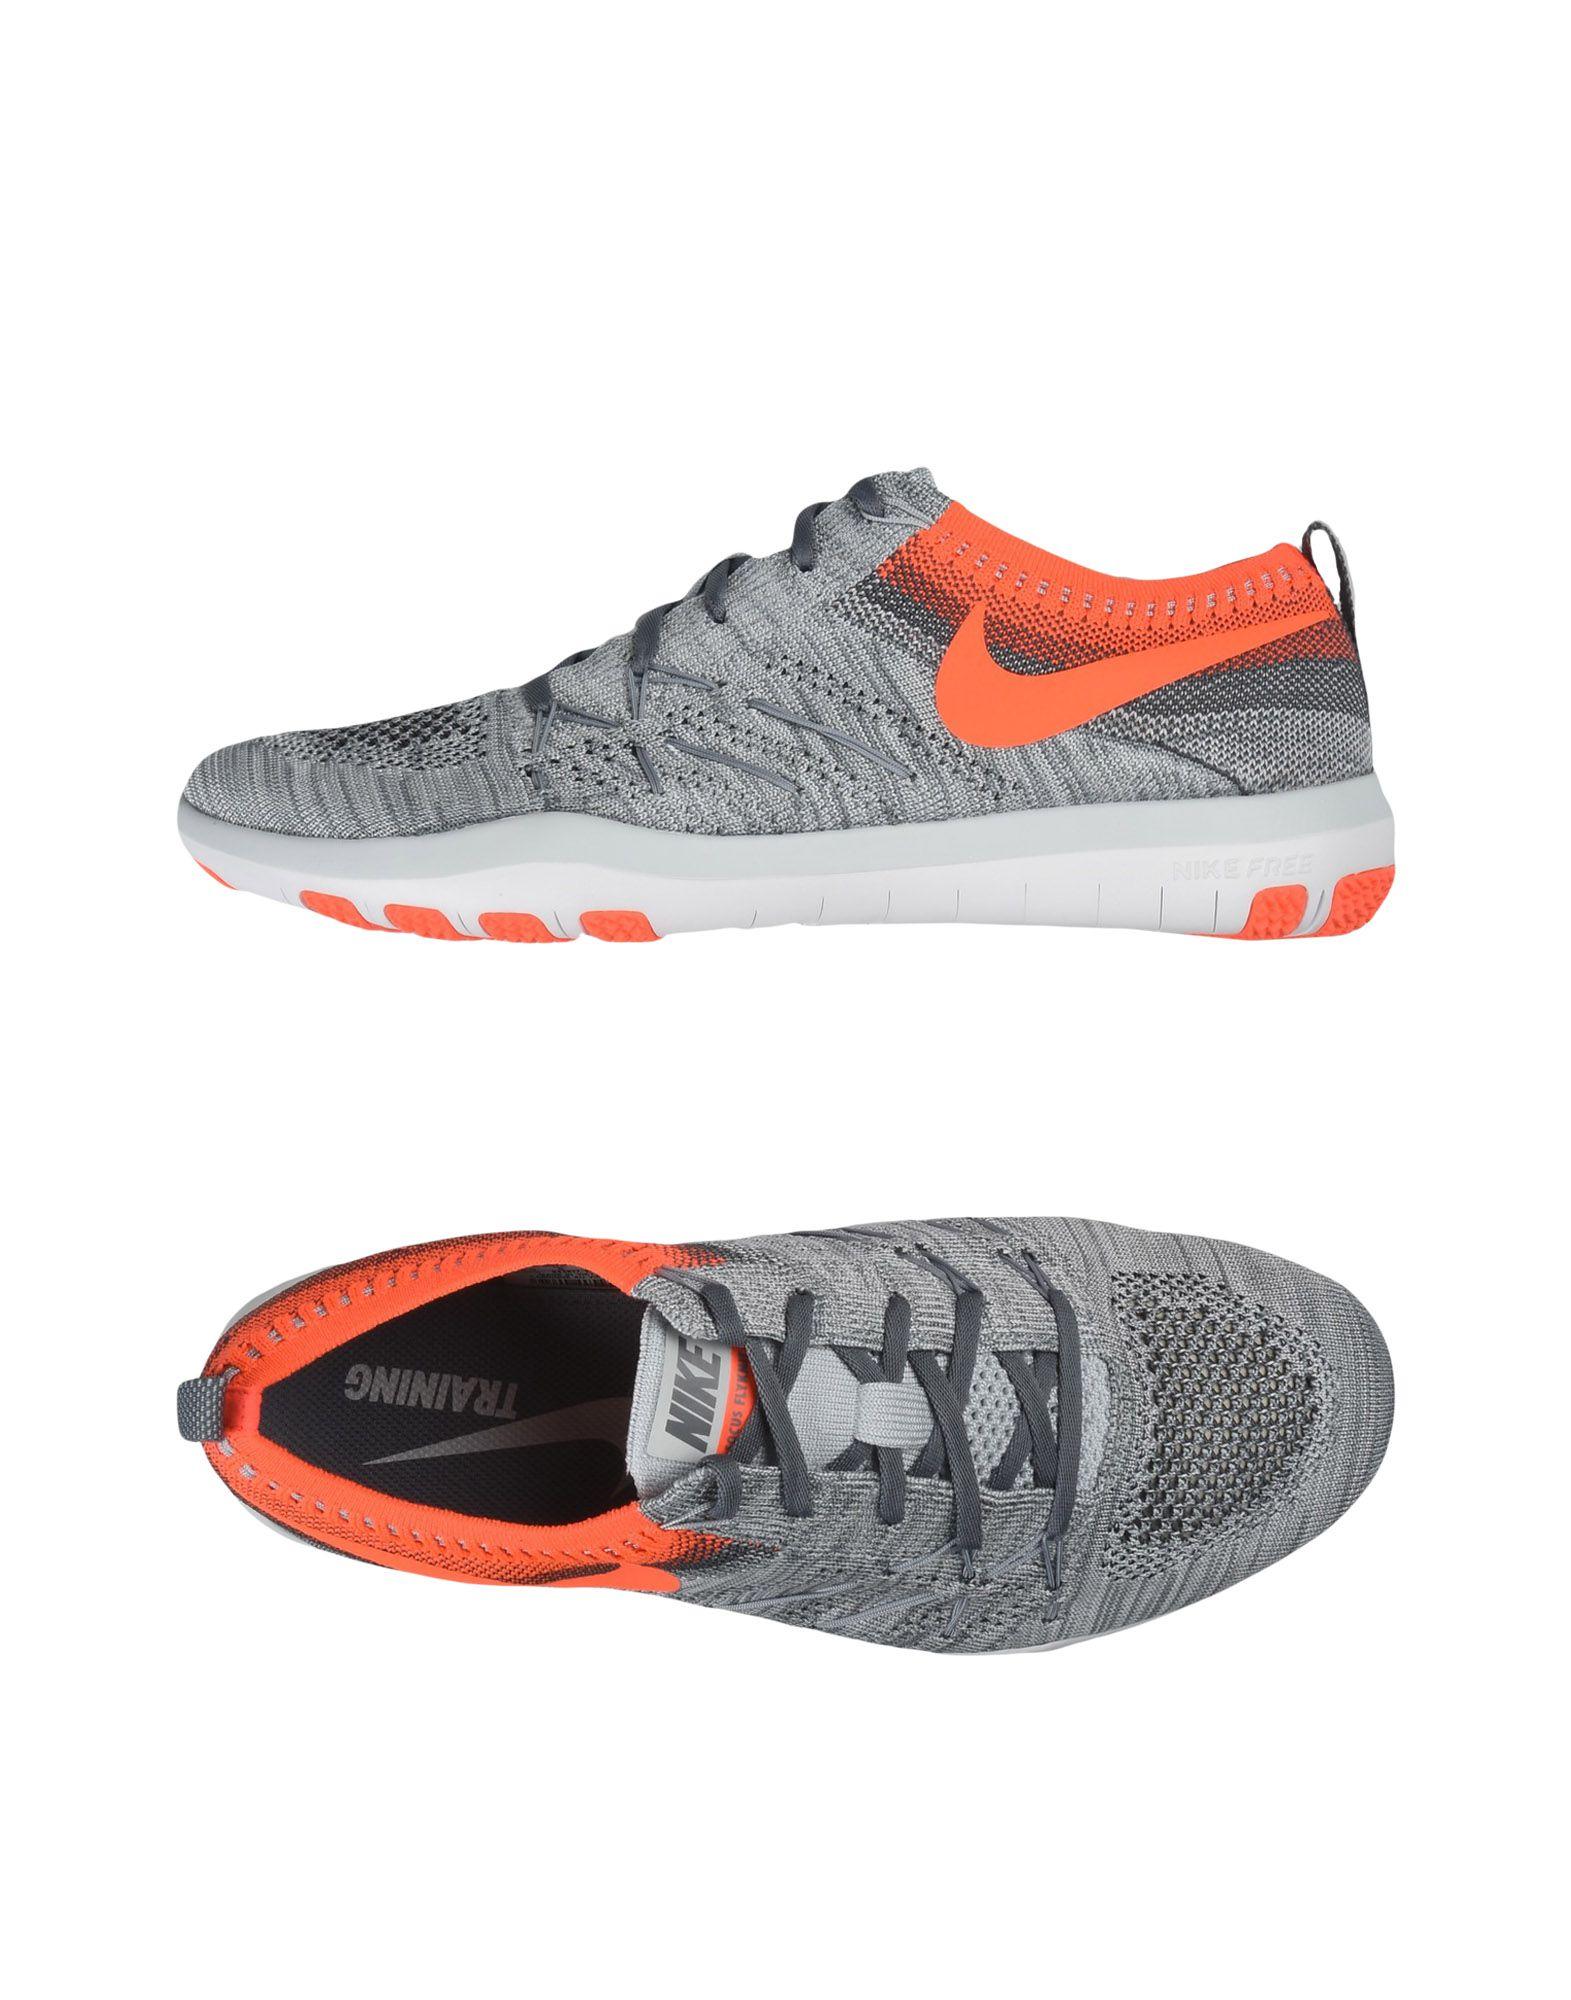 Nike   Free Tr Focus Flyknit  11218872PH Gute Qualität beliebte Schuhe